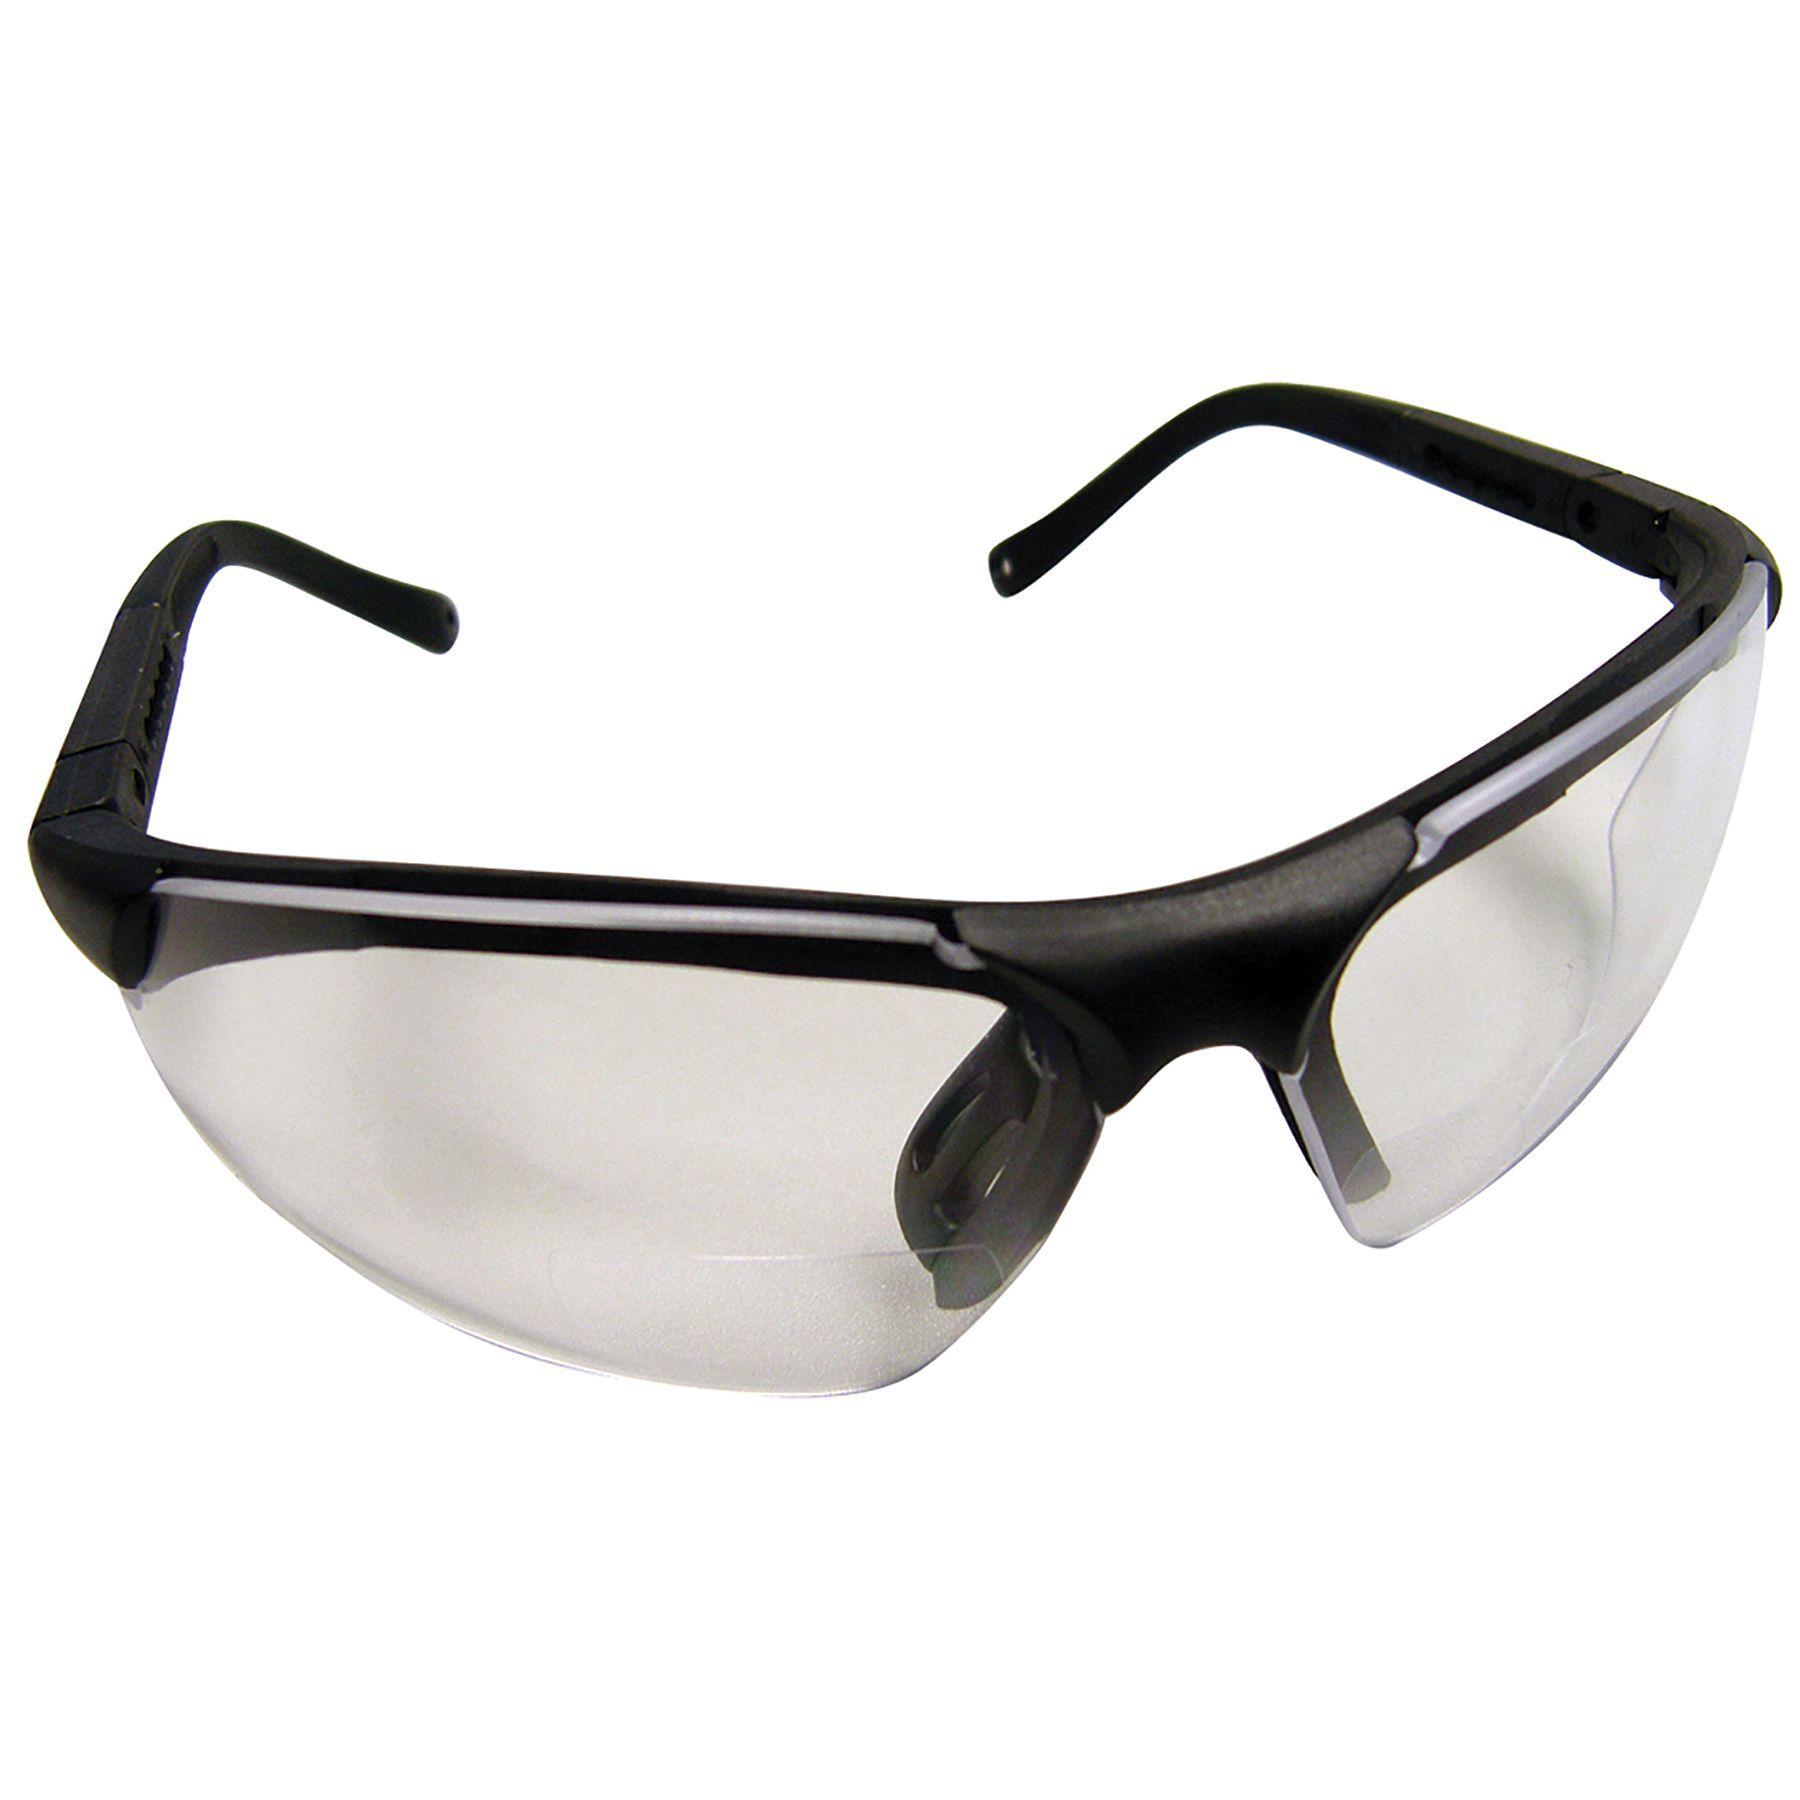 SAS Safety Corporation 5412000 2.0X Reader Lens Safety